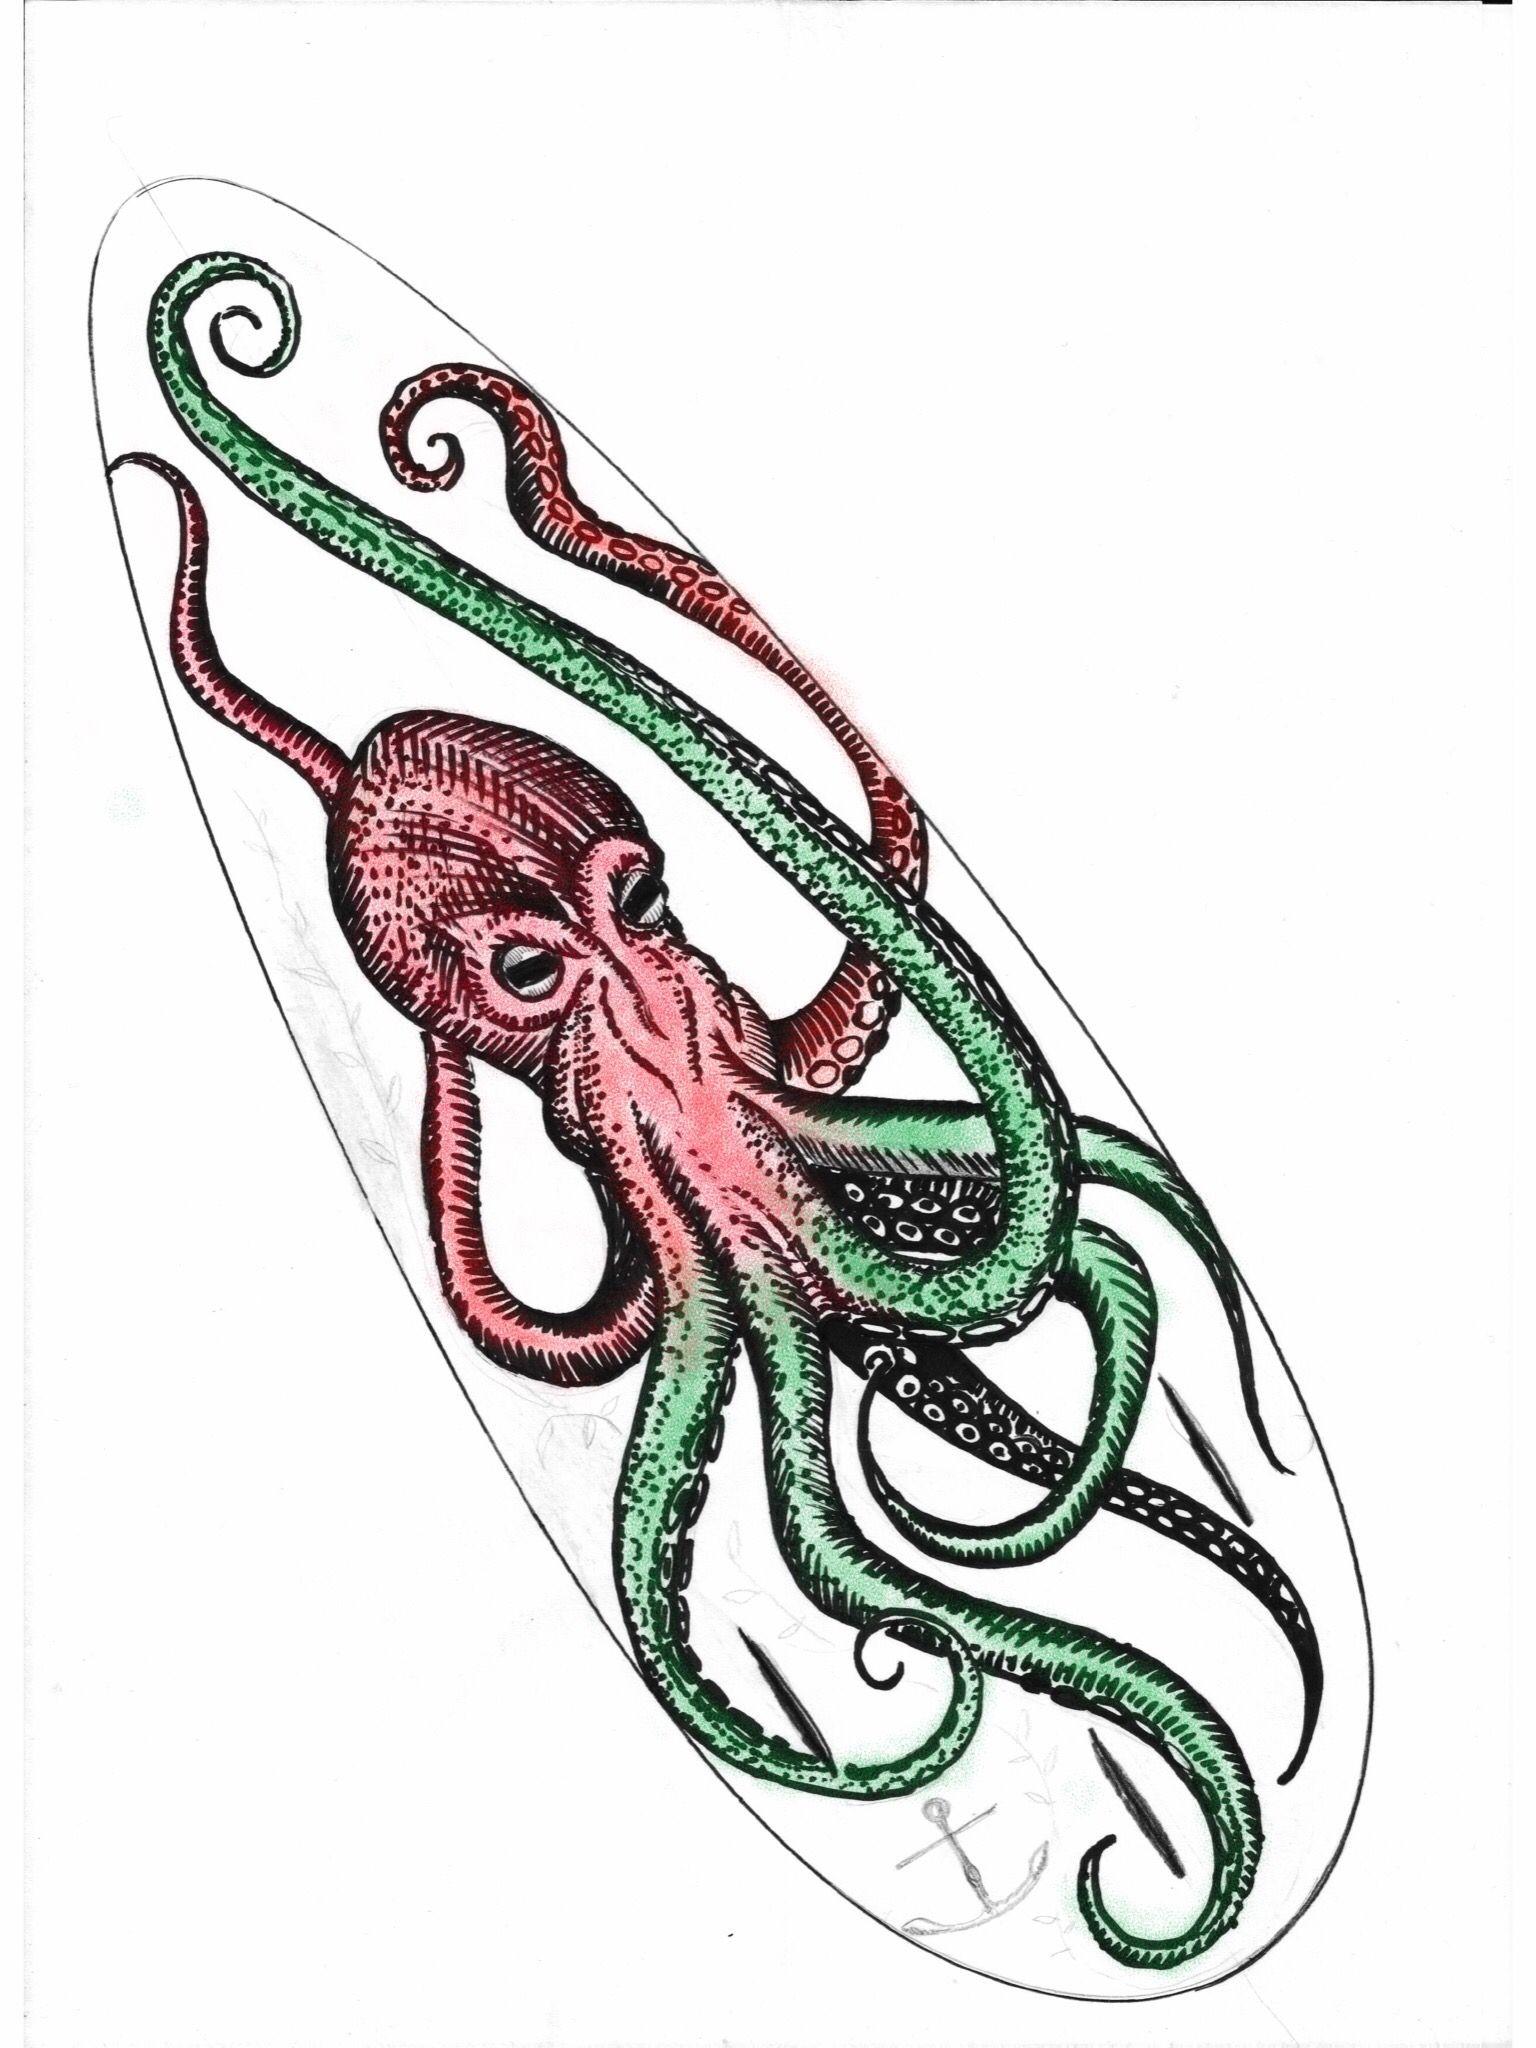 Octopus Papercraft Octopus Kraken Drawing for My Surfboard